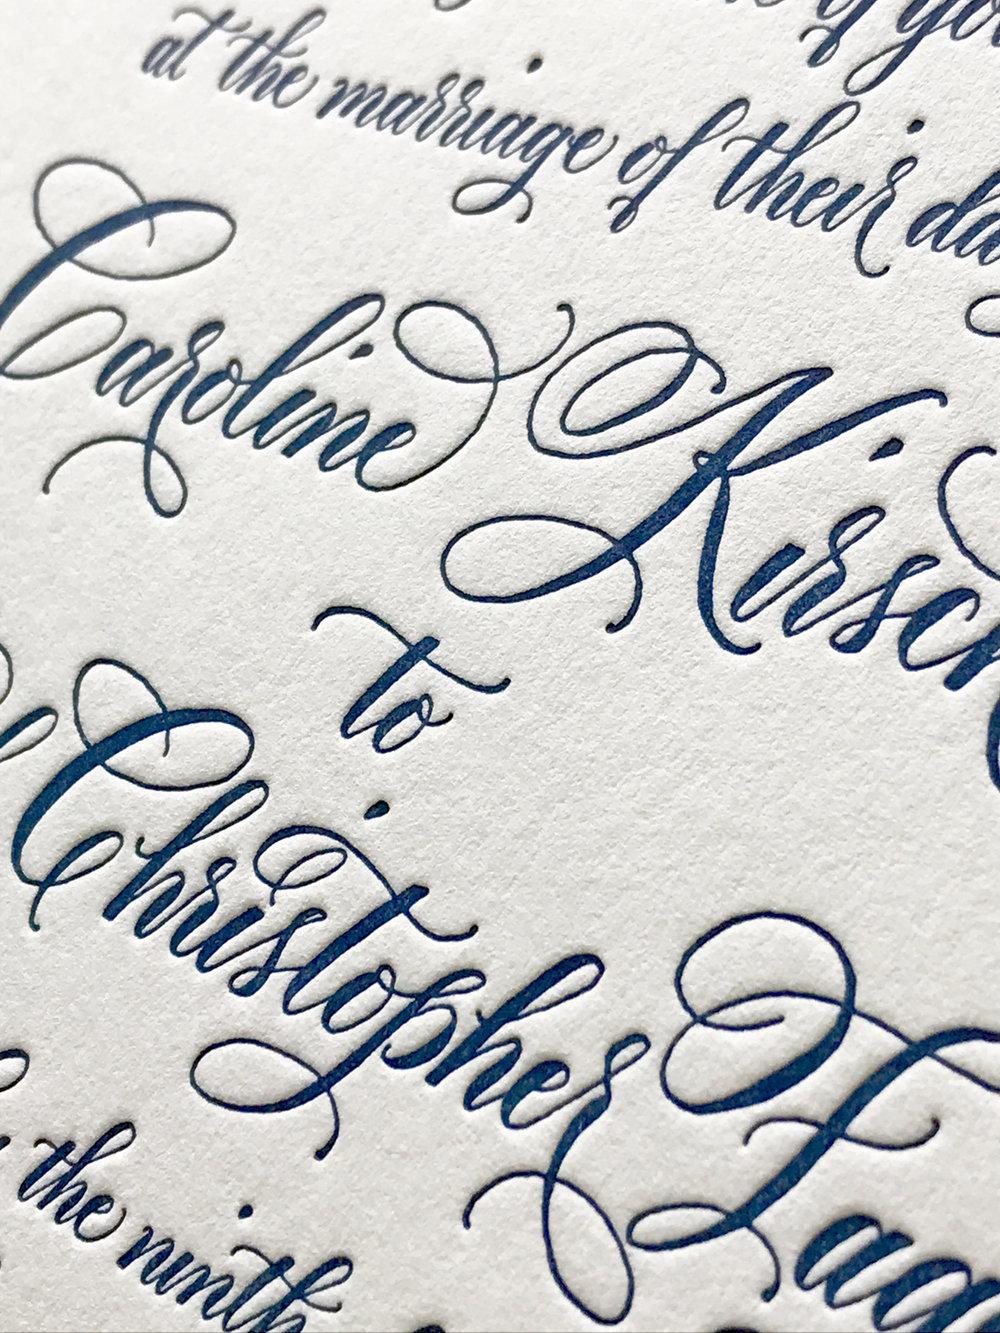 letterpress-calligraphy-bespoke-wedding-invitations-angeliqueink.jpg